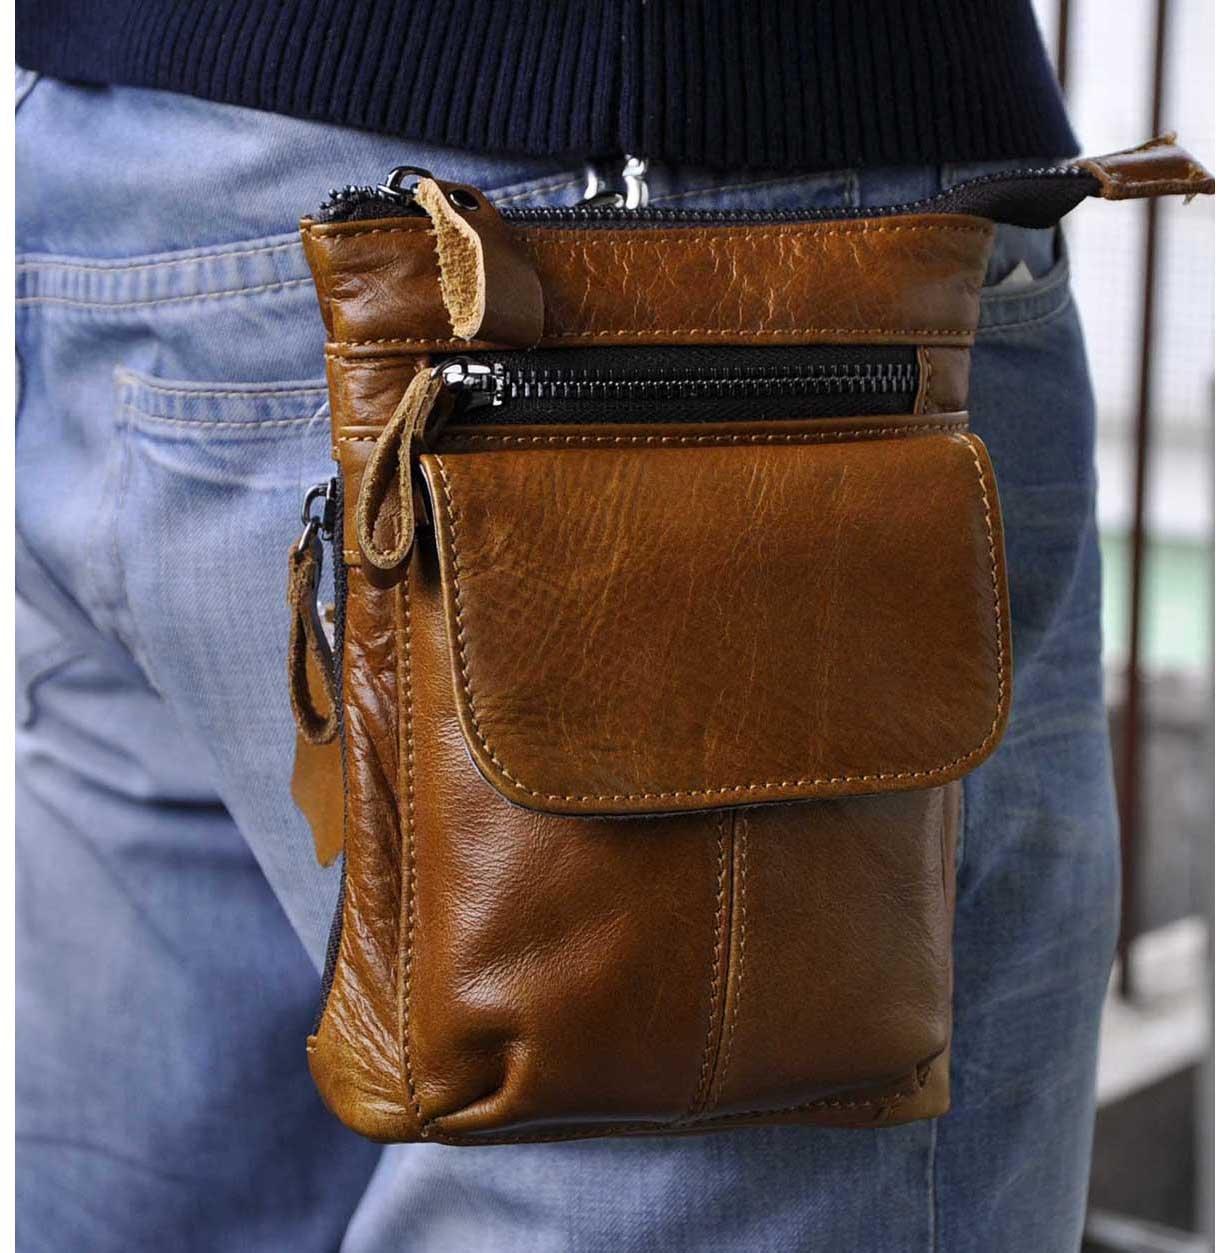 Le'aokuu Men Genuine Leather Small Messenger Bag Fanny Waist Bag Hip Bum Belt Pack Phone Pouch 611-1 (611-1 coffee-large size) 611-1 Large Size